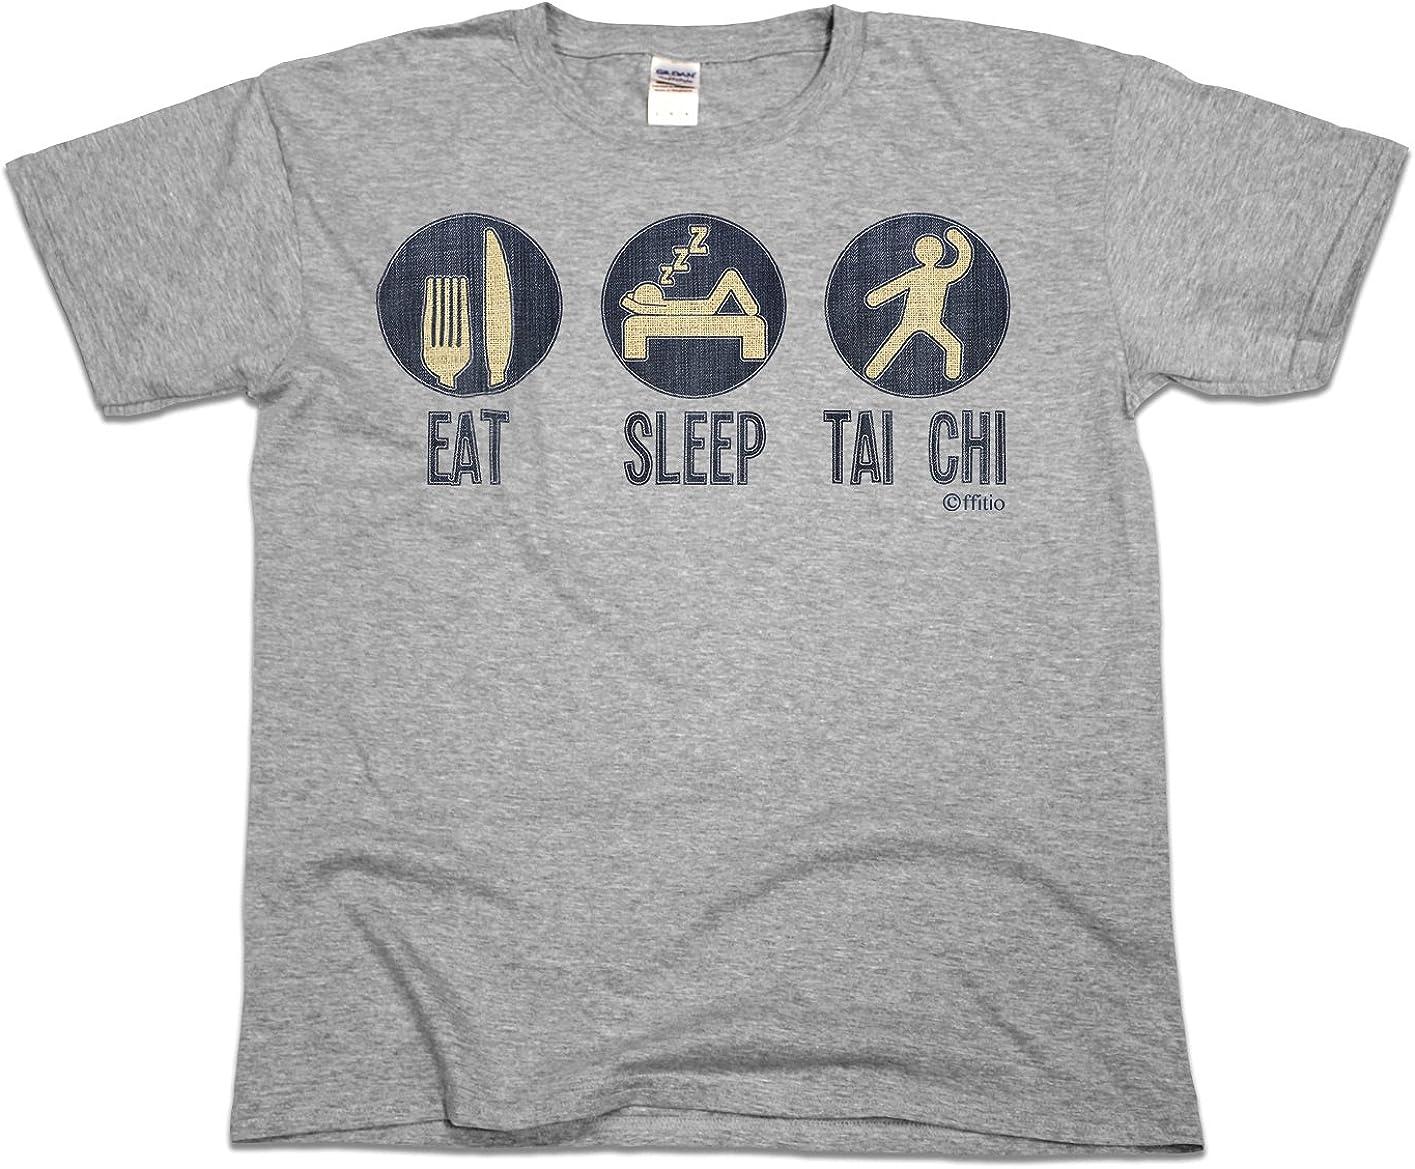 ffitio Eat Sleep Tai Chi Mens Martial Arts Gift T-Shirt Camiseta para Hombre: Amazon.es: Ropa y accesorios